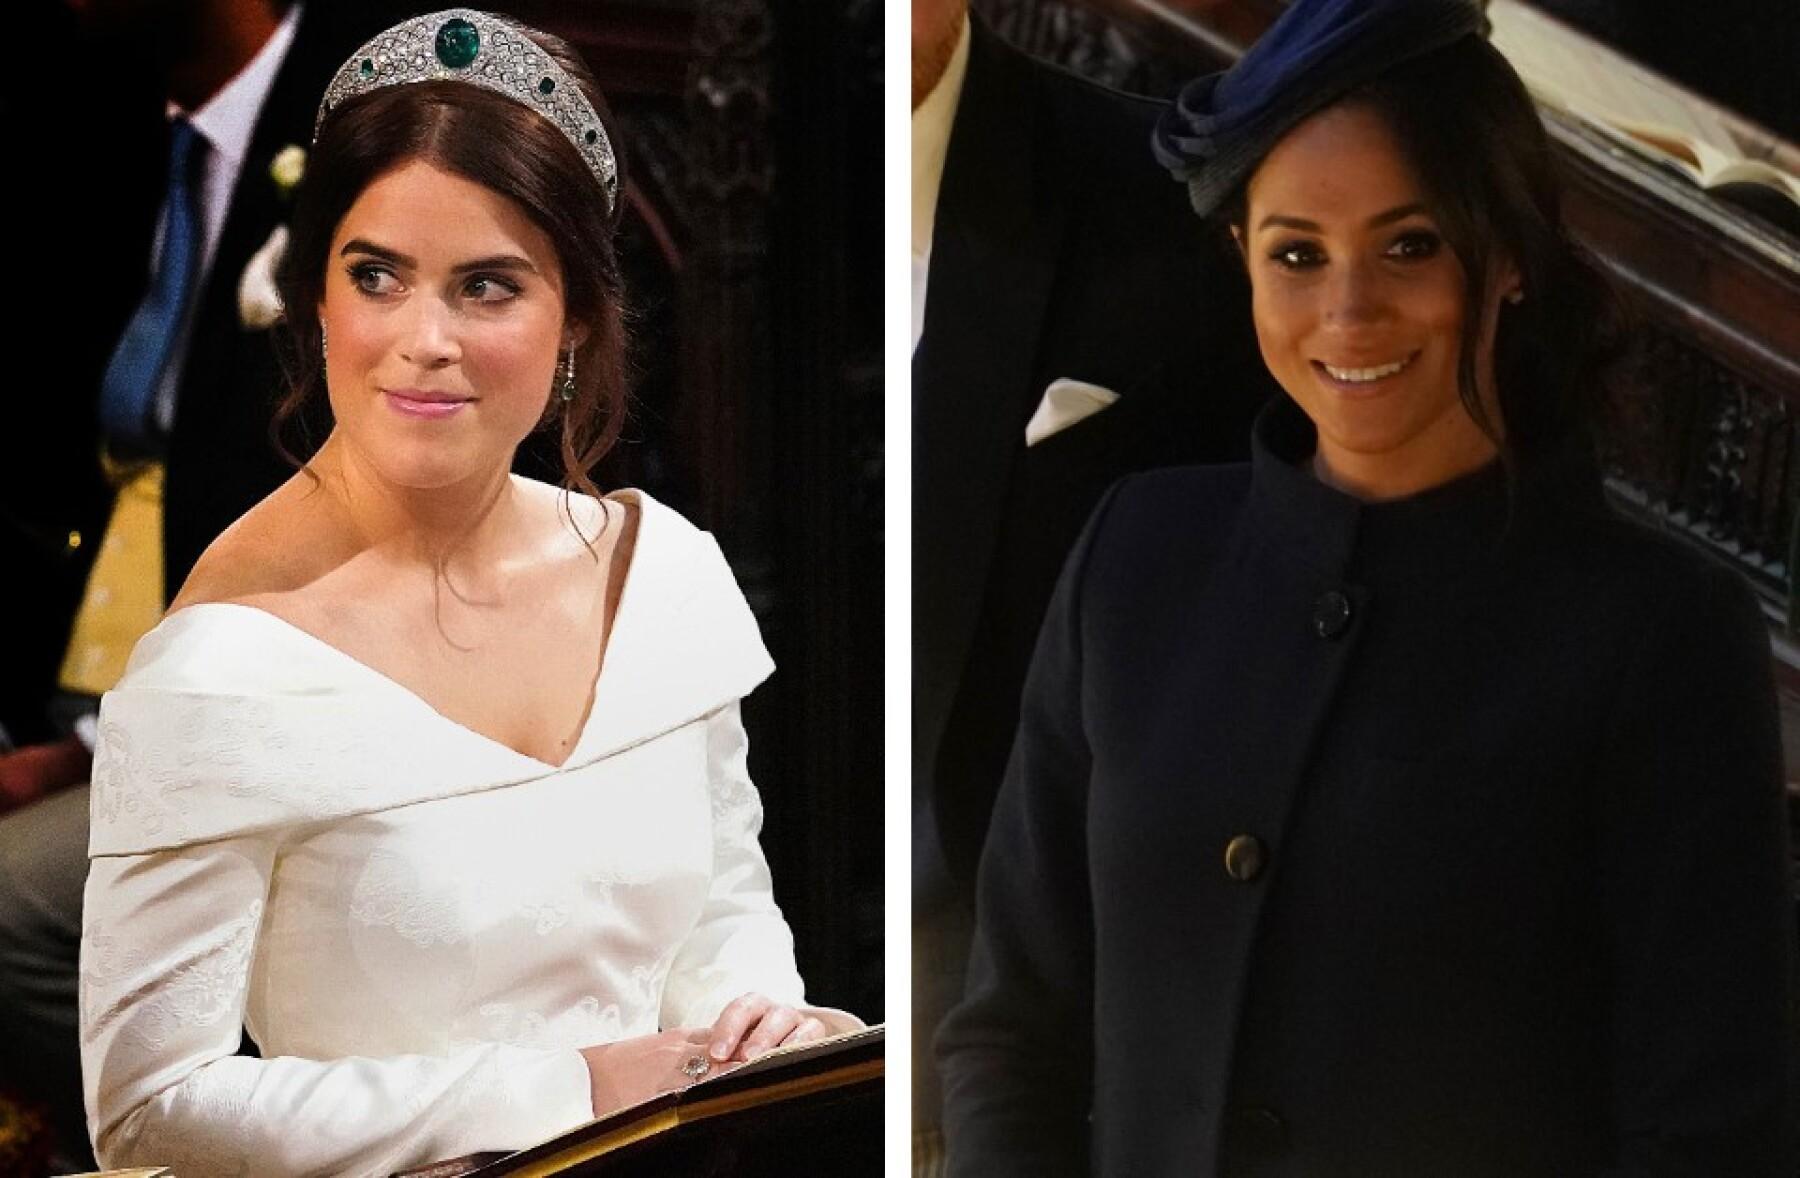 Princesa Eugenia y Meghan Markle